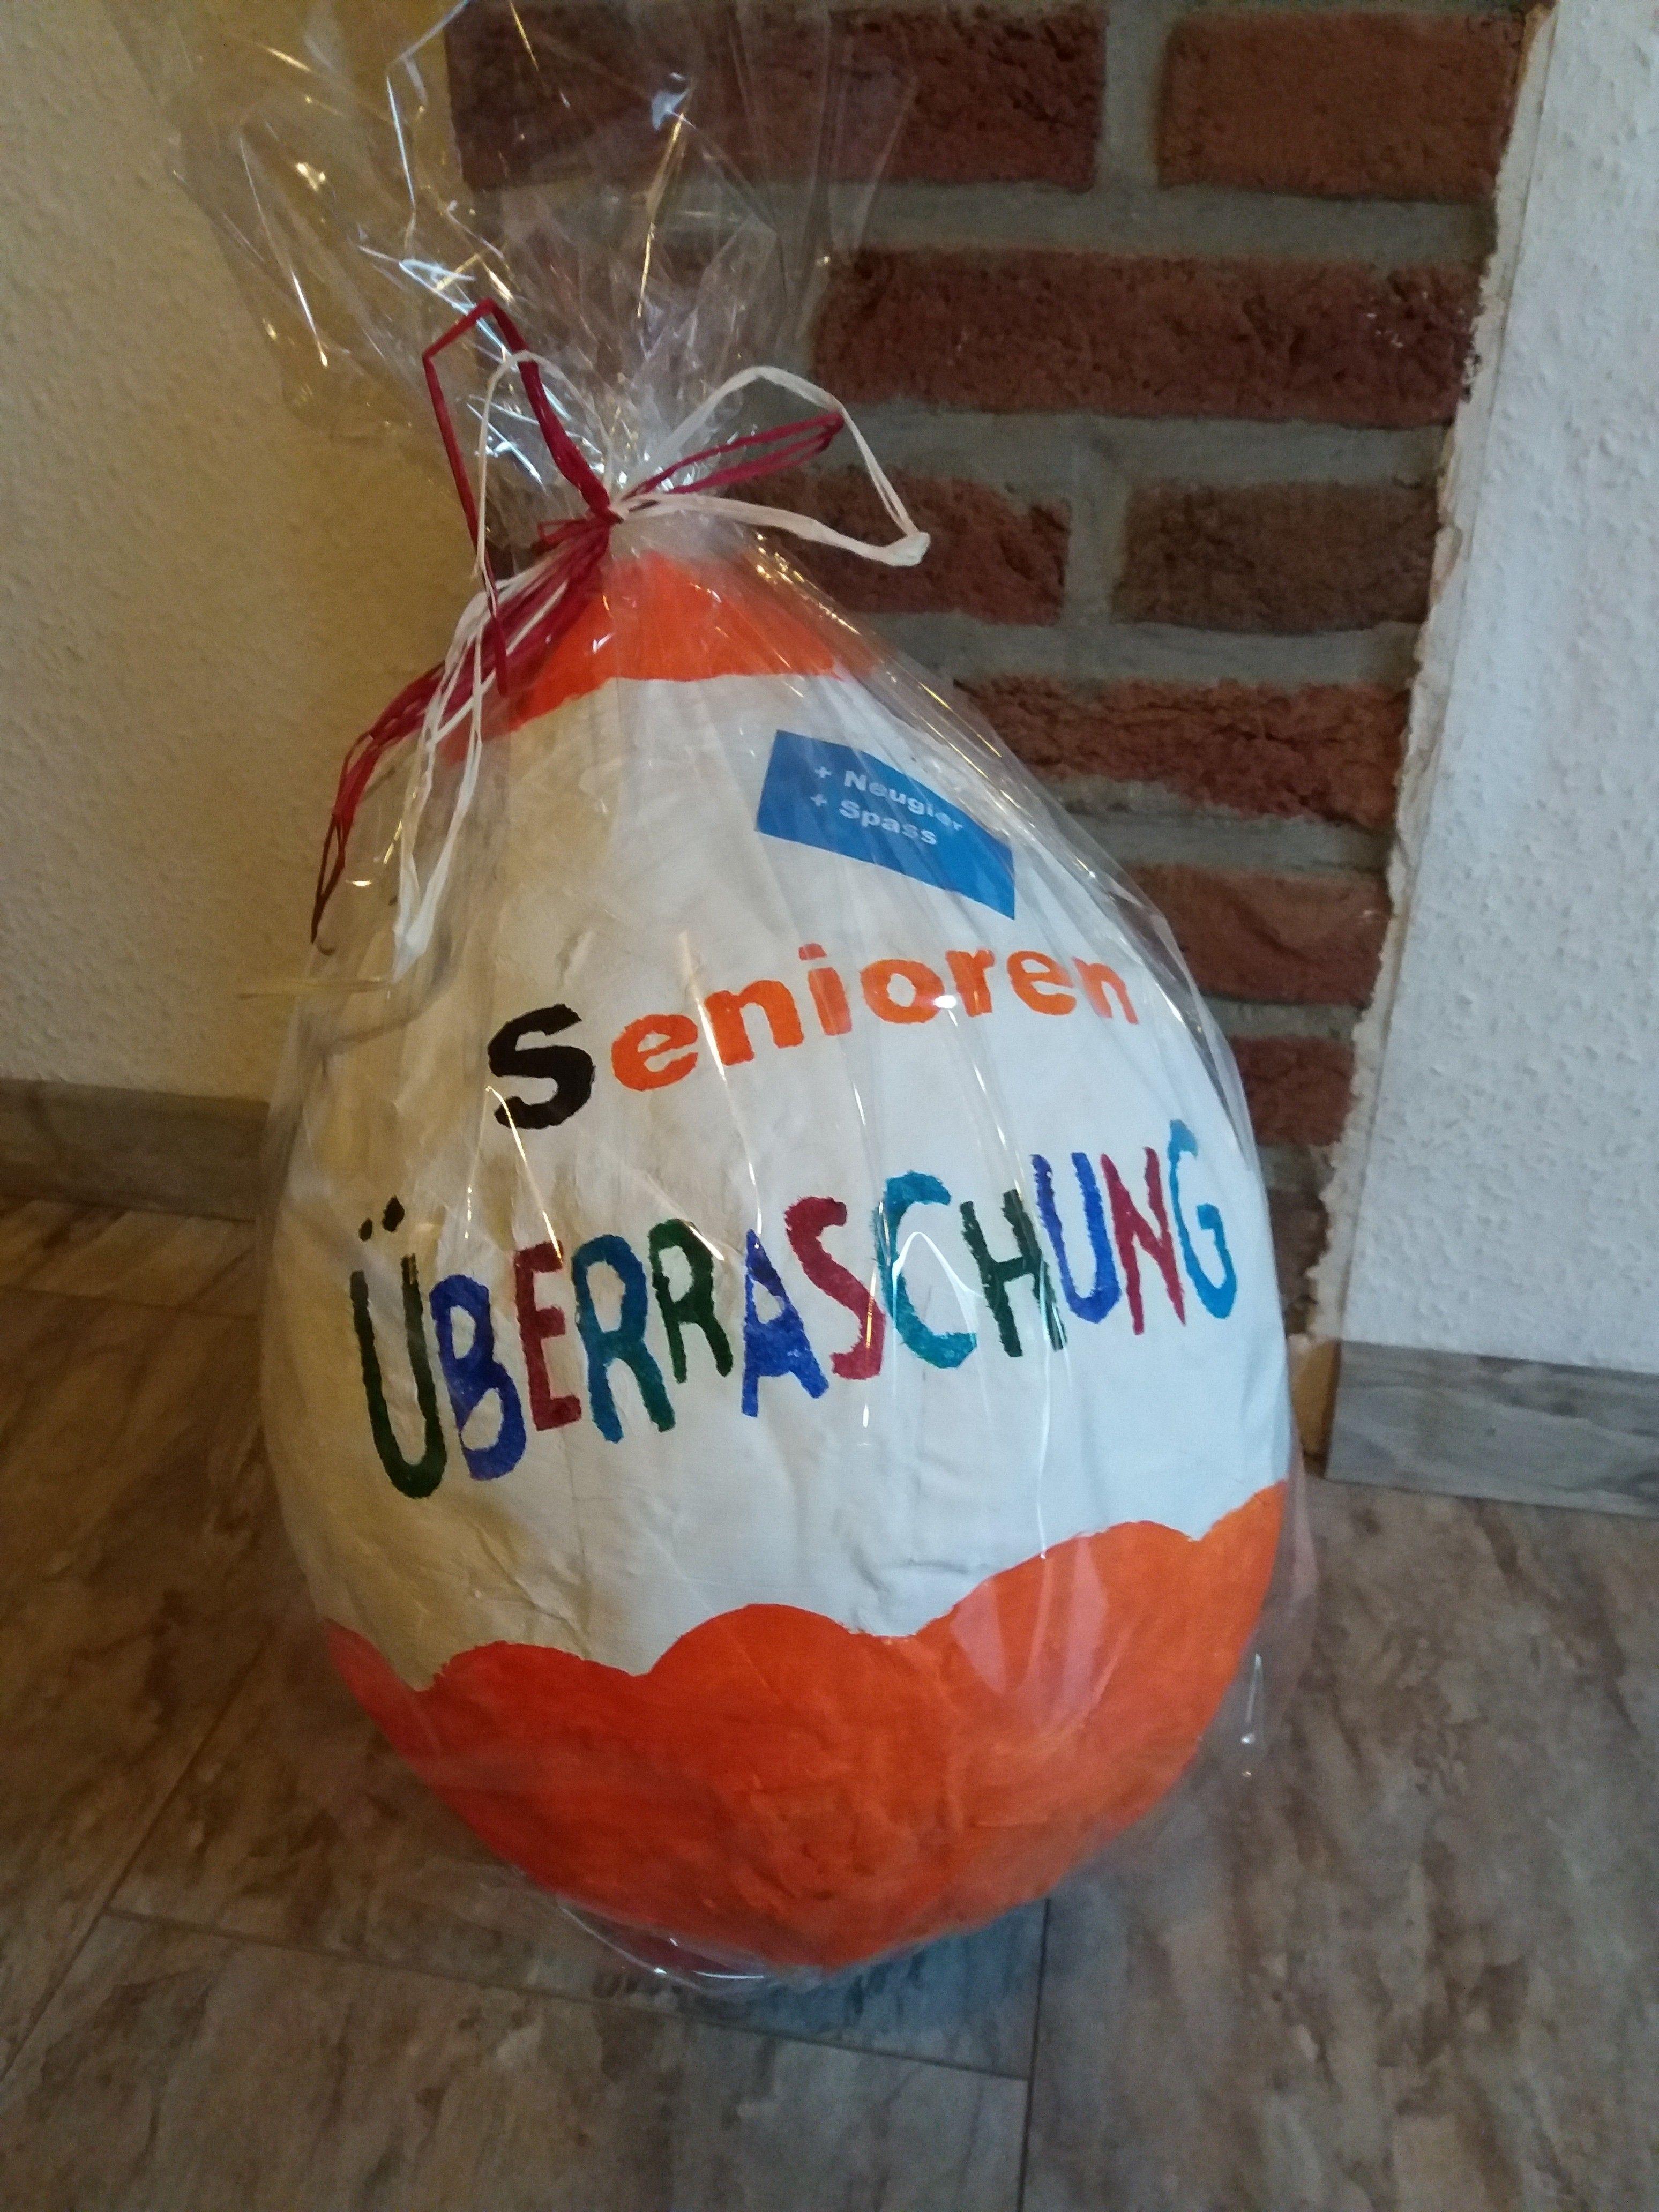 Senioren Uberraschung Geschenk Ideen Diy Presents Present Gift